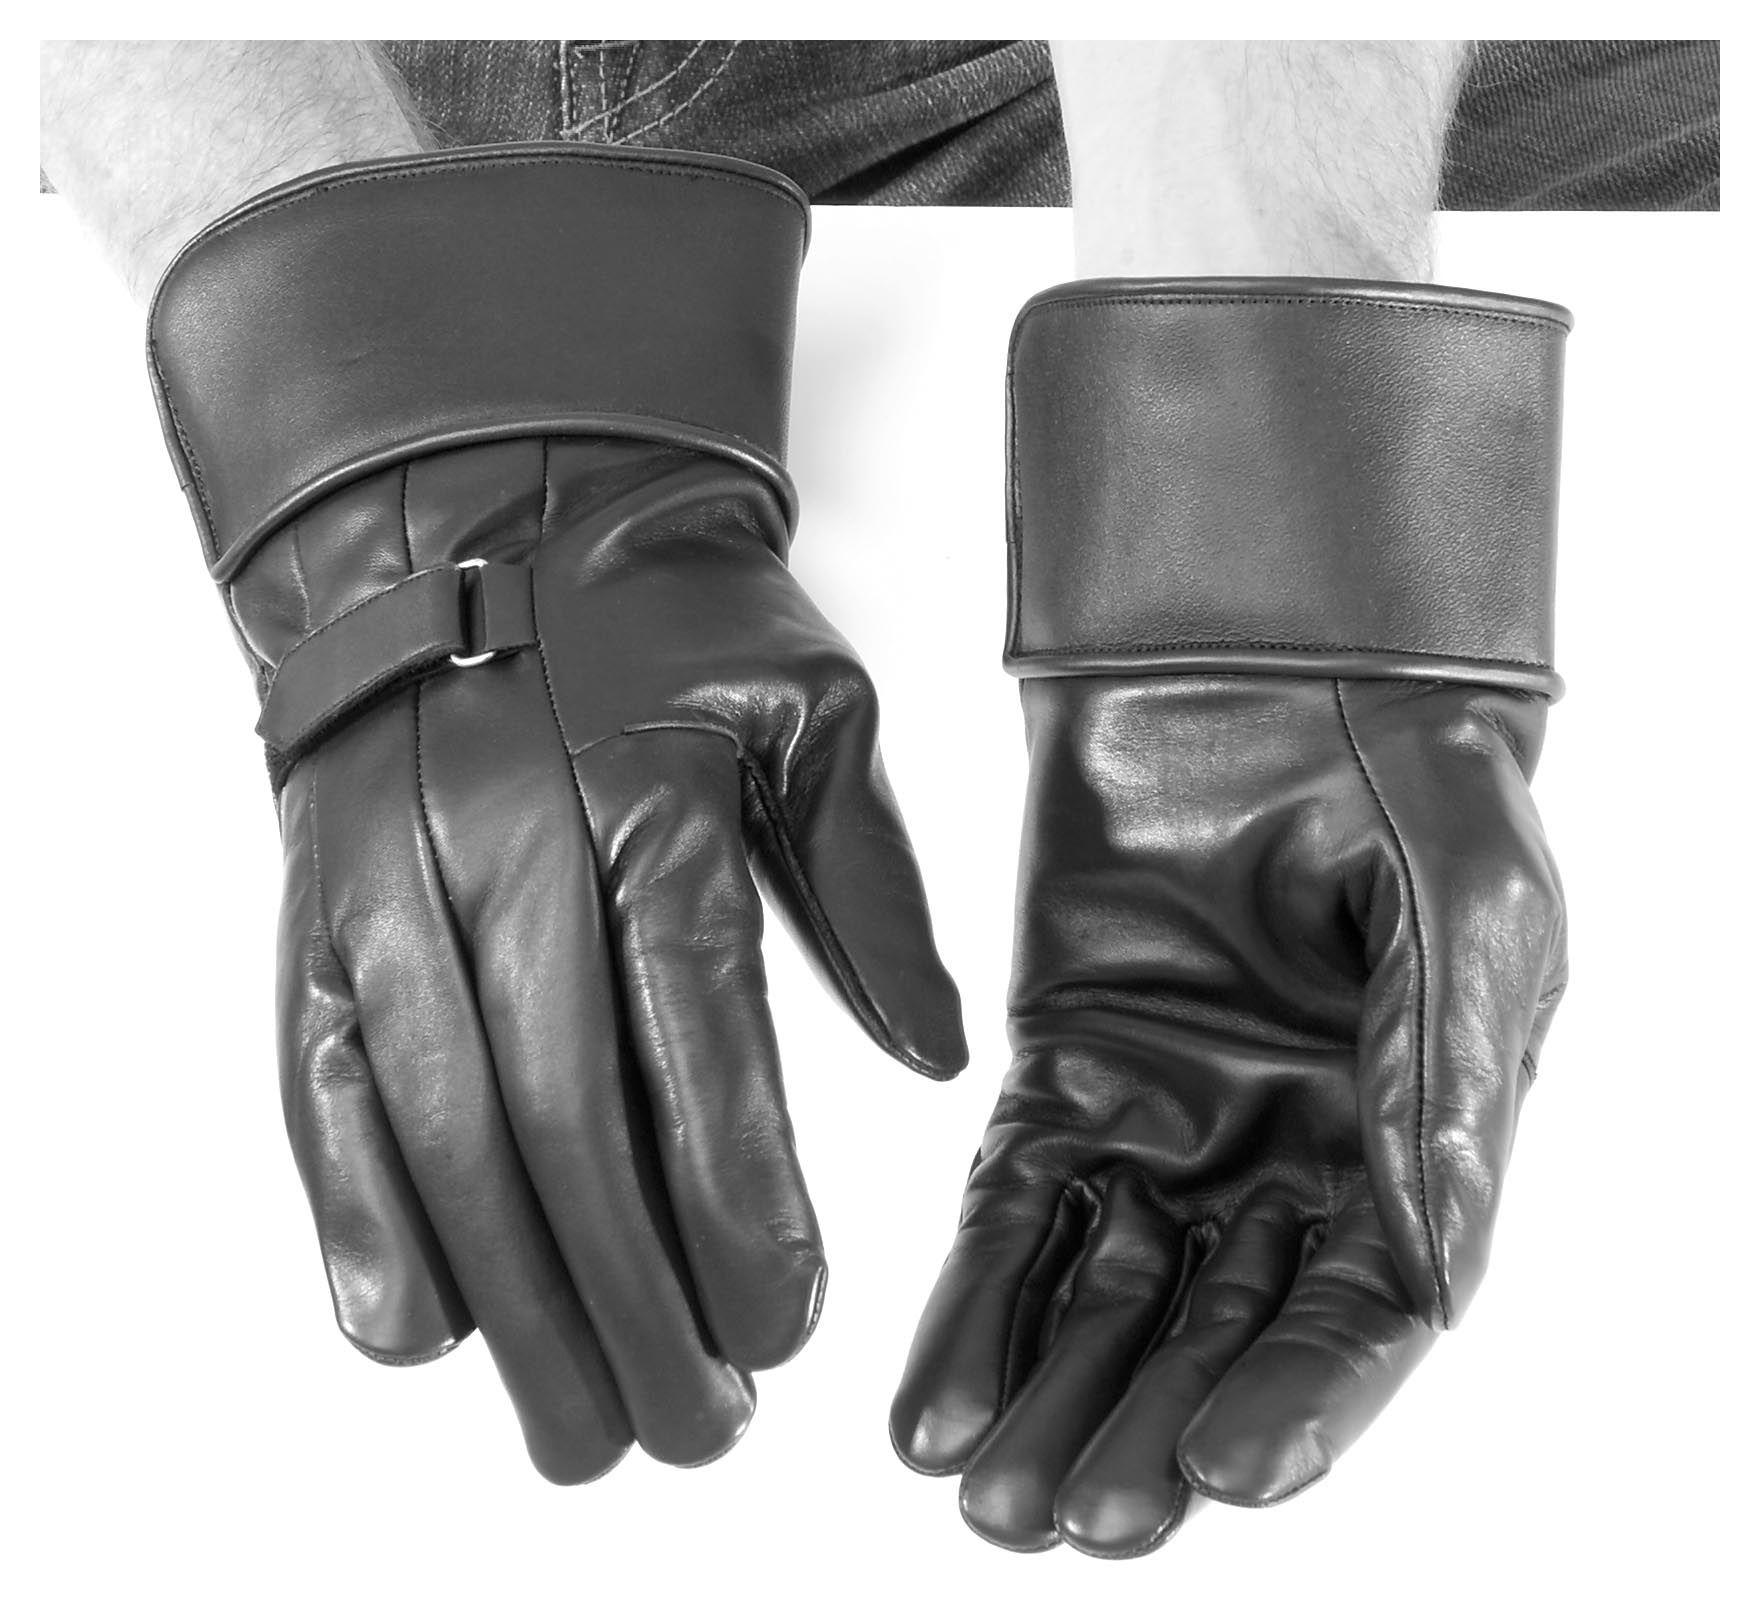 Leather gauntlet driving gloves - Leather Gauntlet Driving Gloves 31